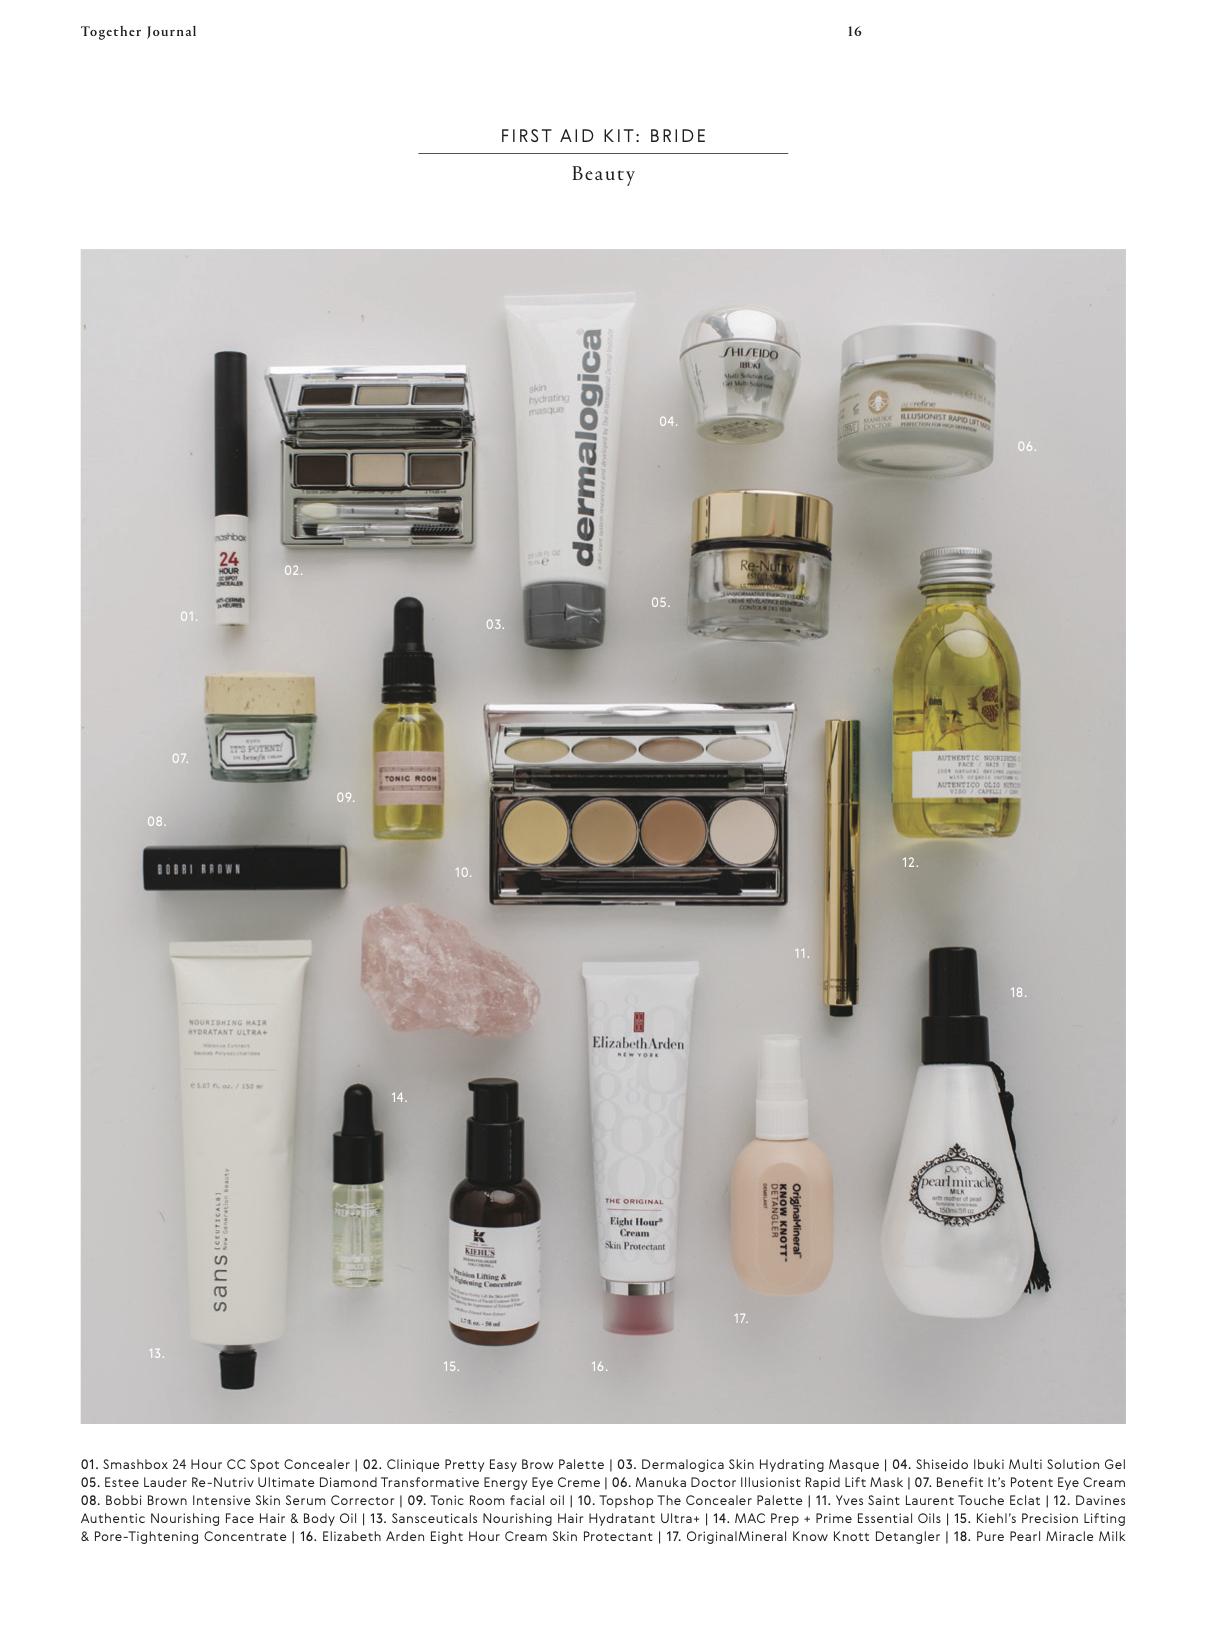 TJ1_016-017_Beauty_Bride First Aid Kit.jpg copy